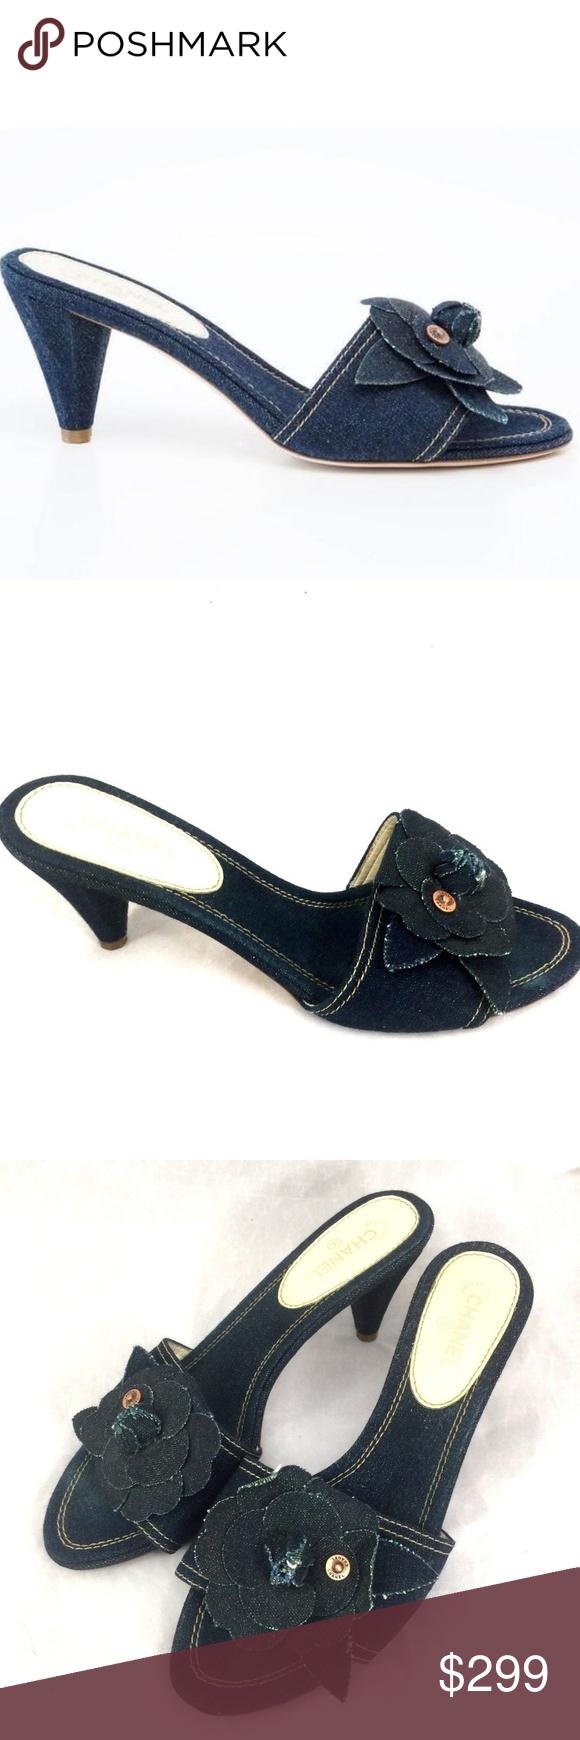 0deb07b2ef933 CHANEL Slide Mule Denim Jean Blue Camellia CC 38.5 CHANEL CAMELLIA ...